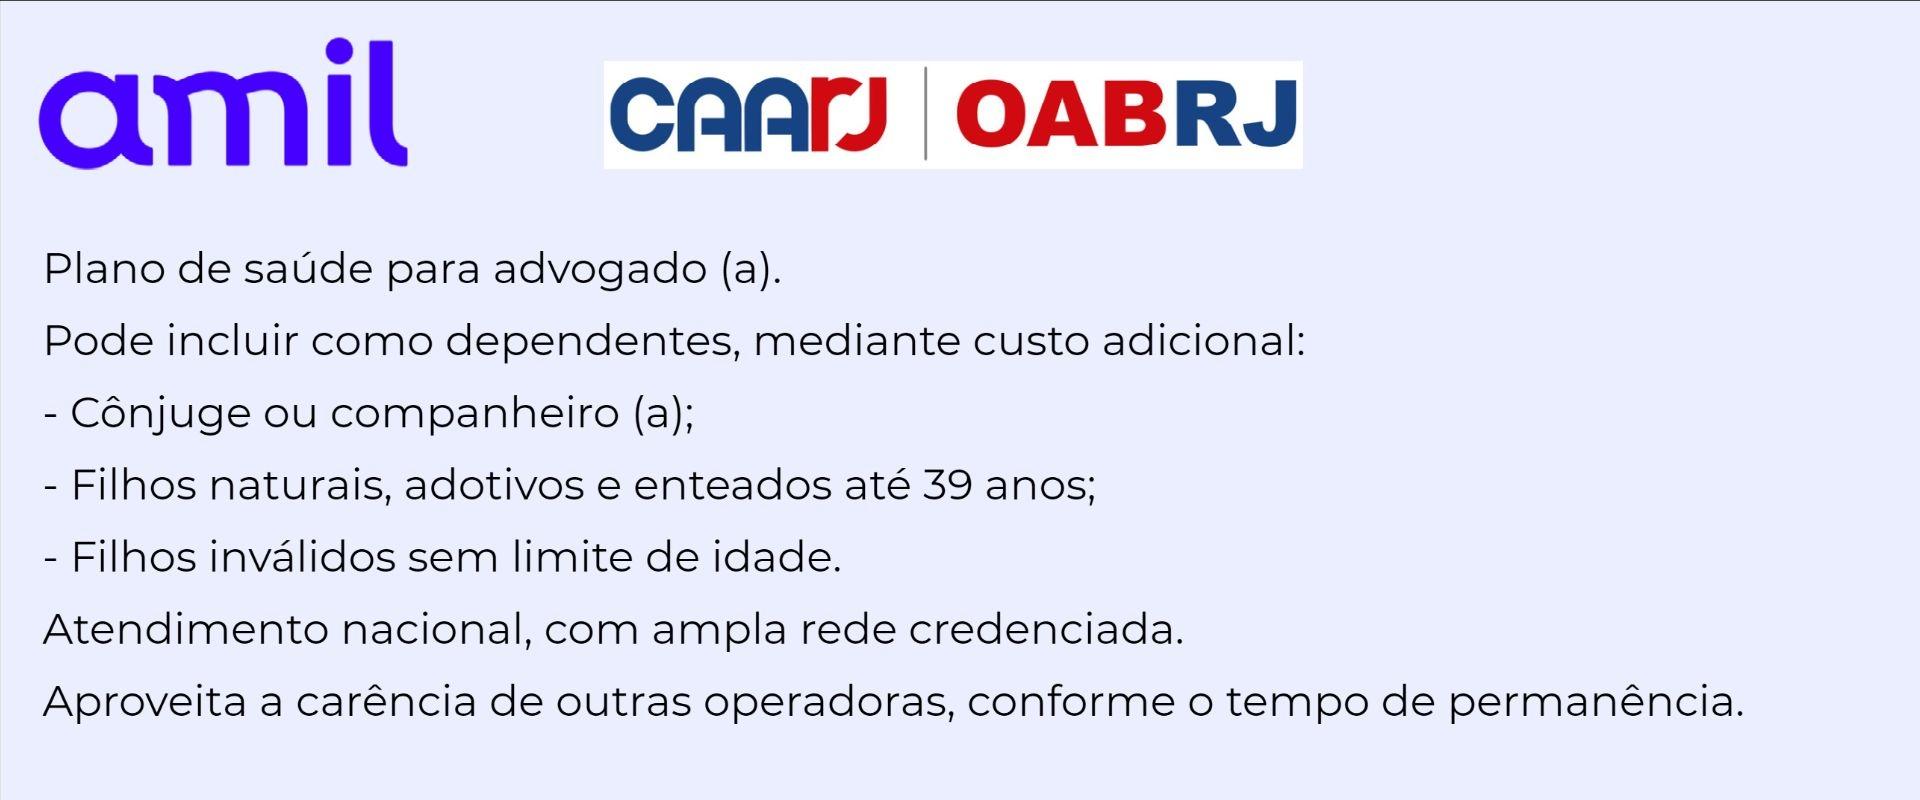 Amil CAARJ